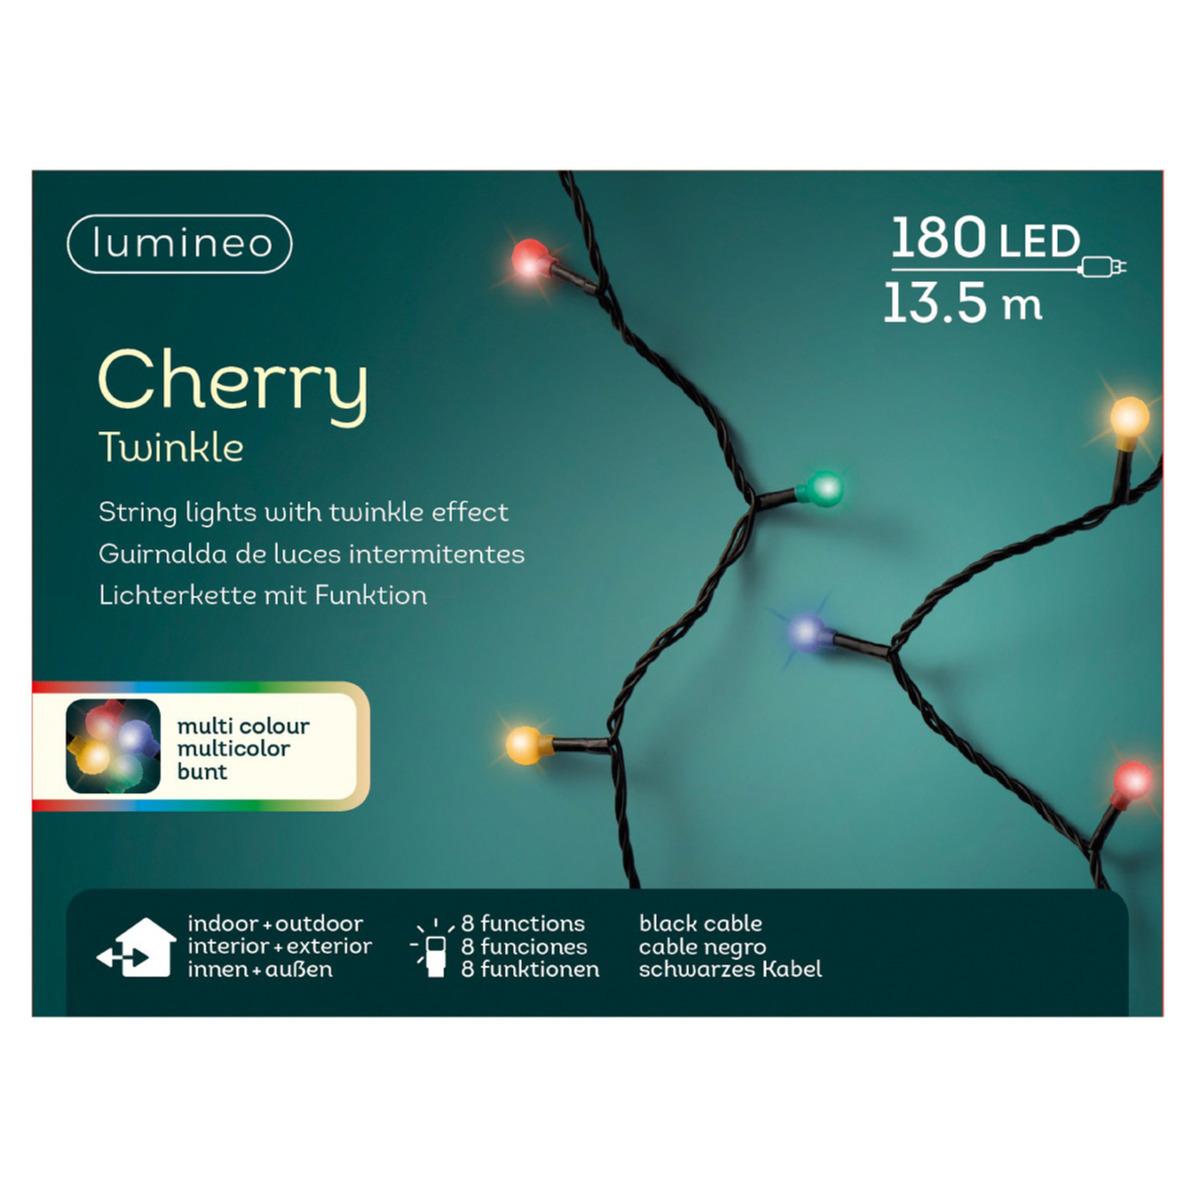 Feestverlichting twinkelend gekleurd met afstandsbediening 180 leds